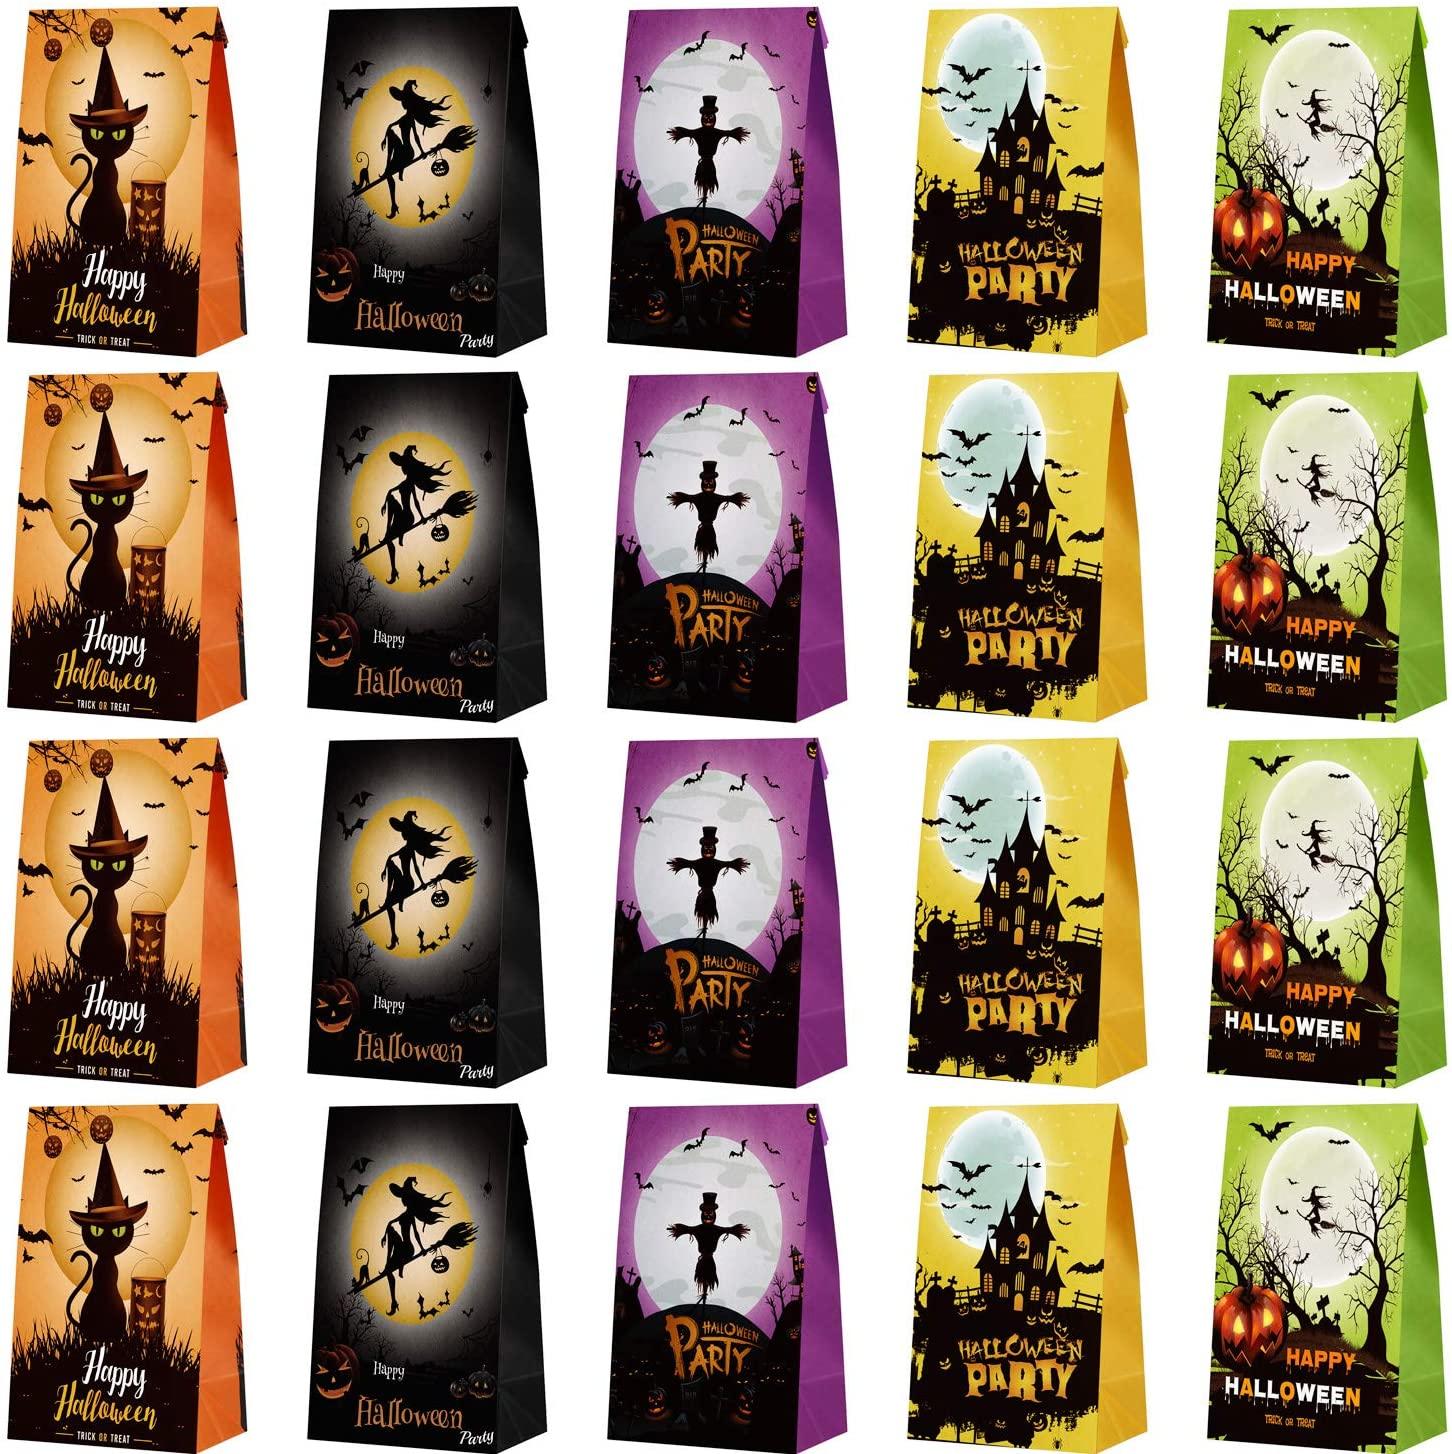 URATOT 60 Pieces Halloween Candy Paper Bags Pumpkin Paper Bags Trick or Treat Kraft Paper Bags for Halloween Parties